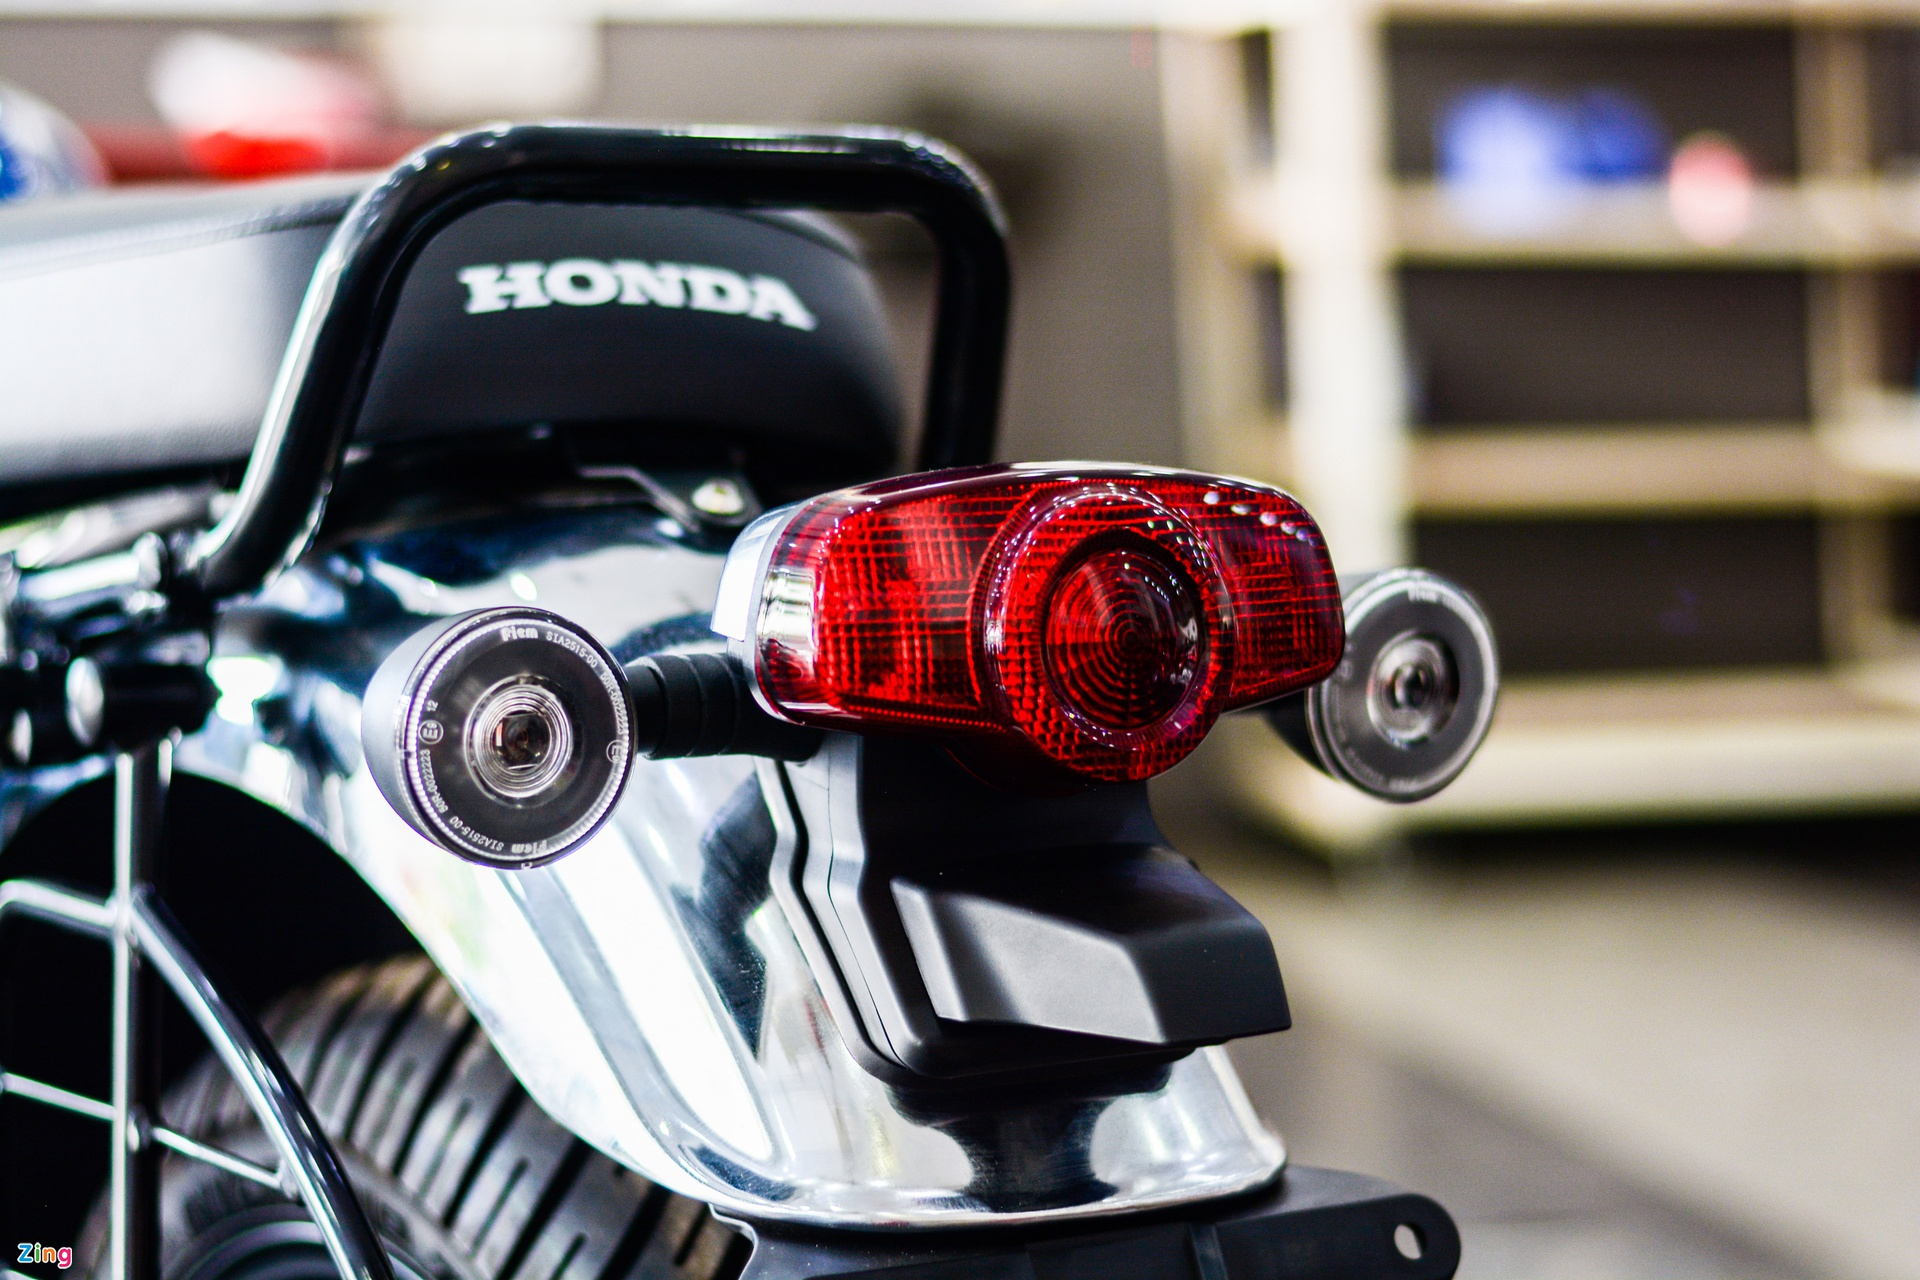 Honda H'ness CB350 DLX Pro xuat hien tai Viet Nam anh 12